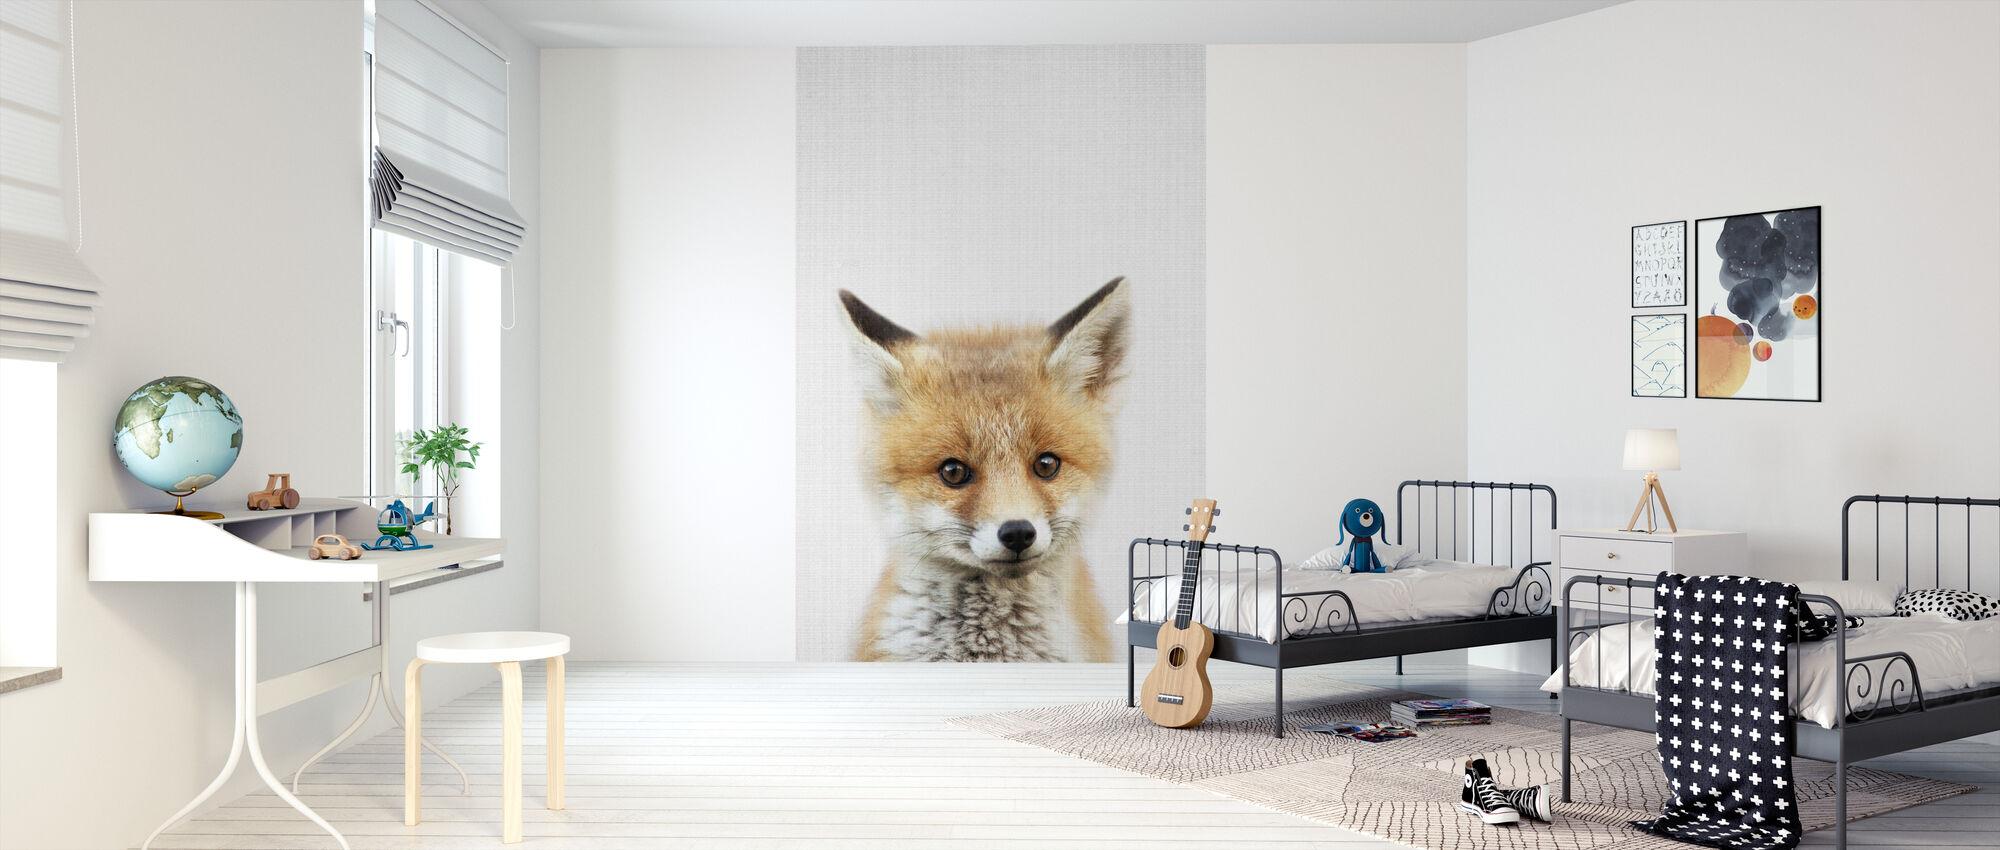 Baby Fox - Tapet - Barnerom